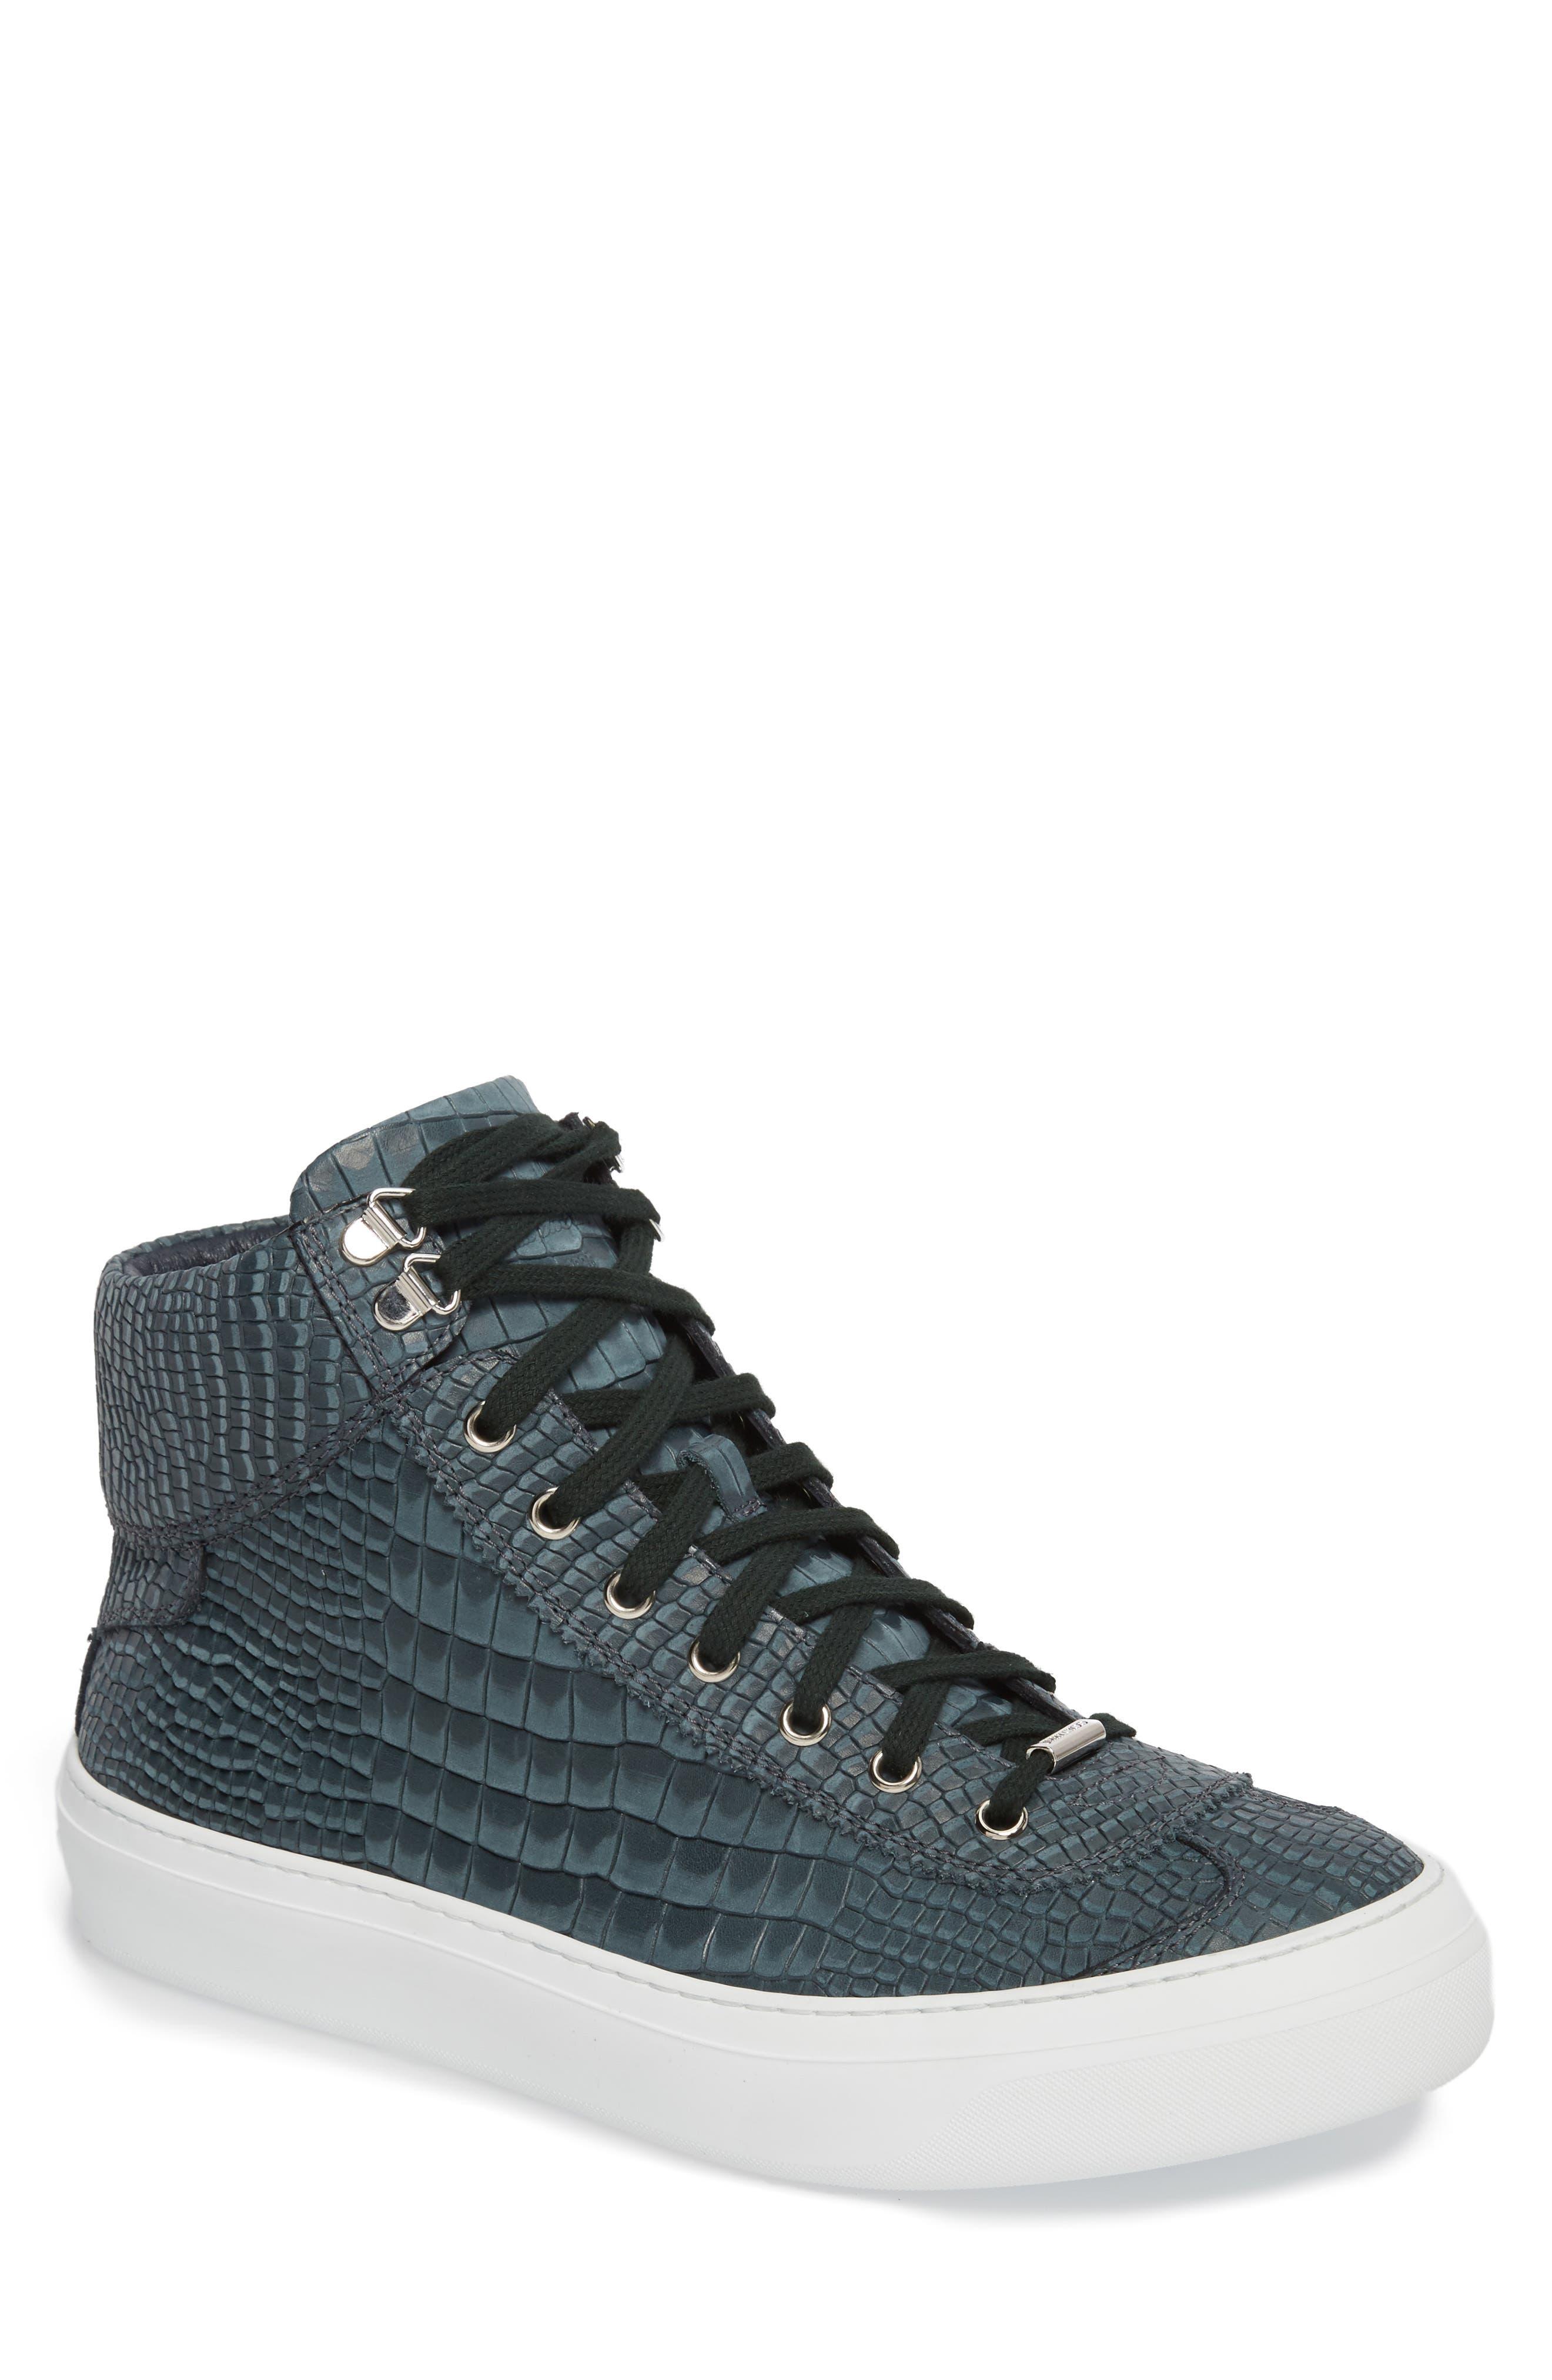 Argyle Sneaker,                         Main,                         color, 301